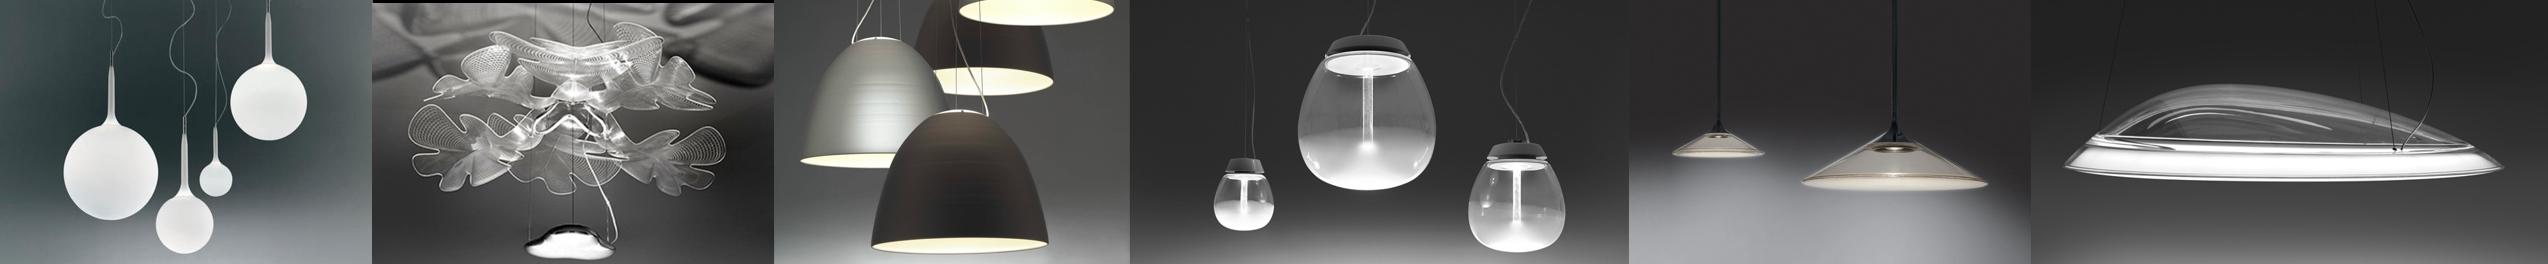 LAMPADE-SOSPENSIONE-ARTEMIDE